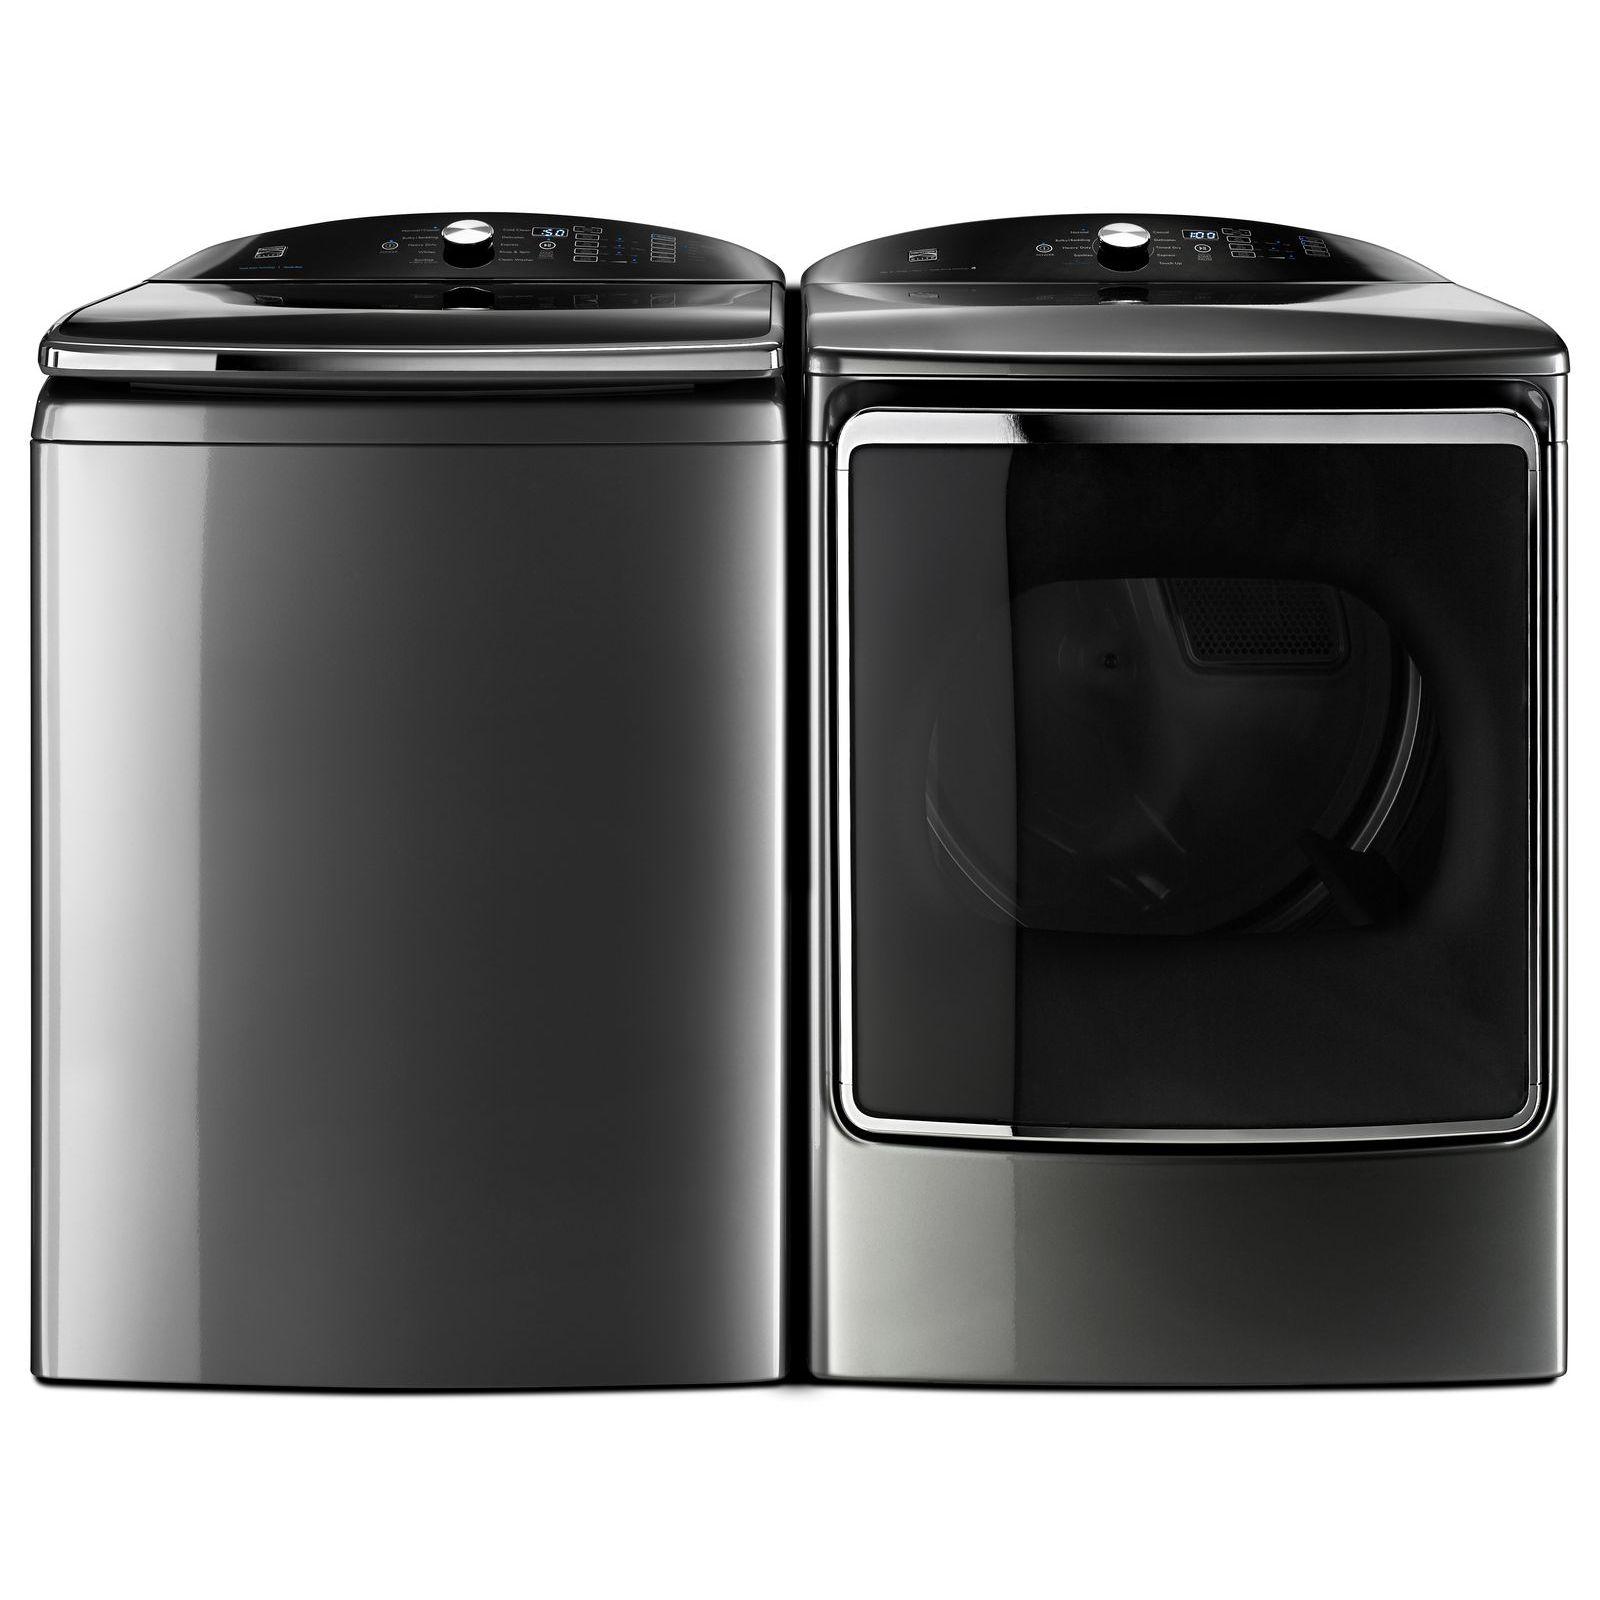 Kenmore Elite 61633 9.2 cu. ft. Electric Dryer w/ SmartDry Ultra Technology – Metallic